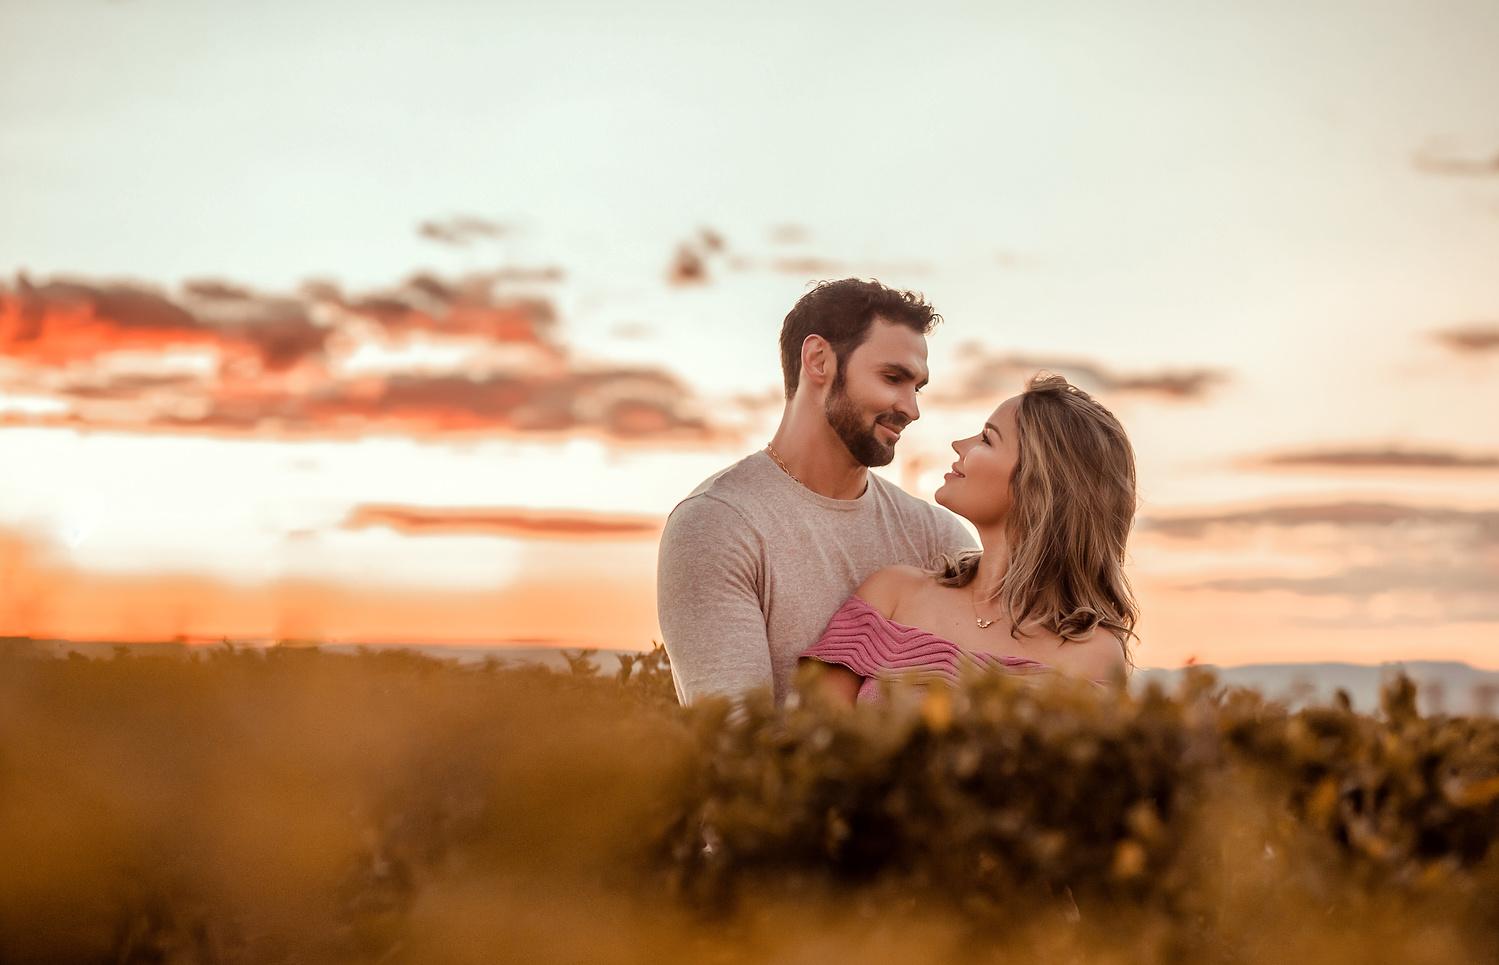 Endless Love by Jonatan Augusto